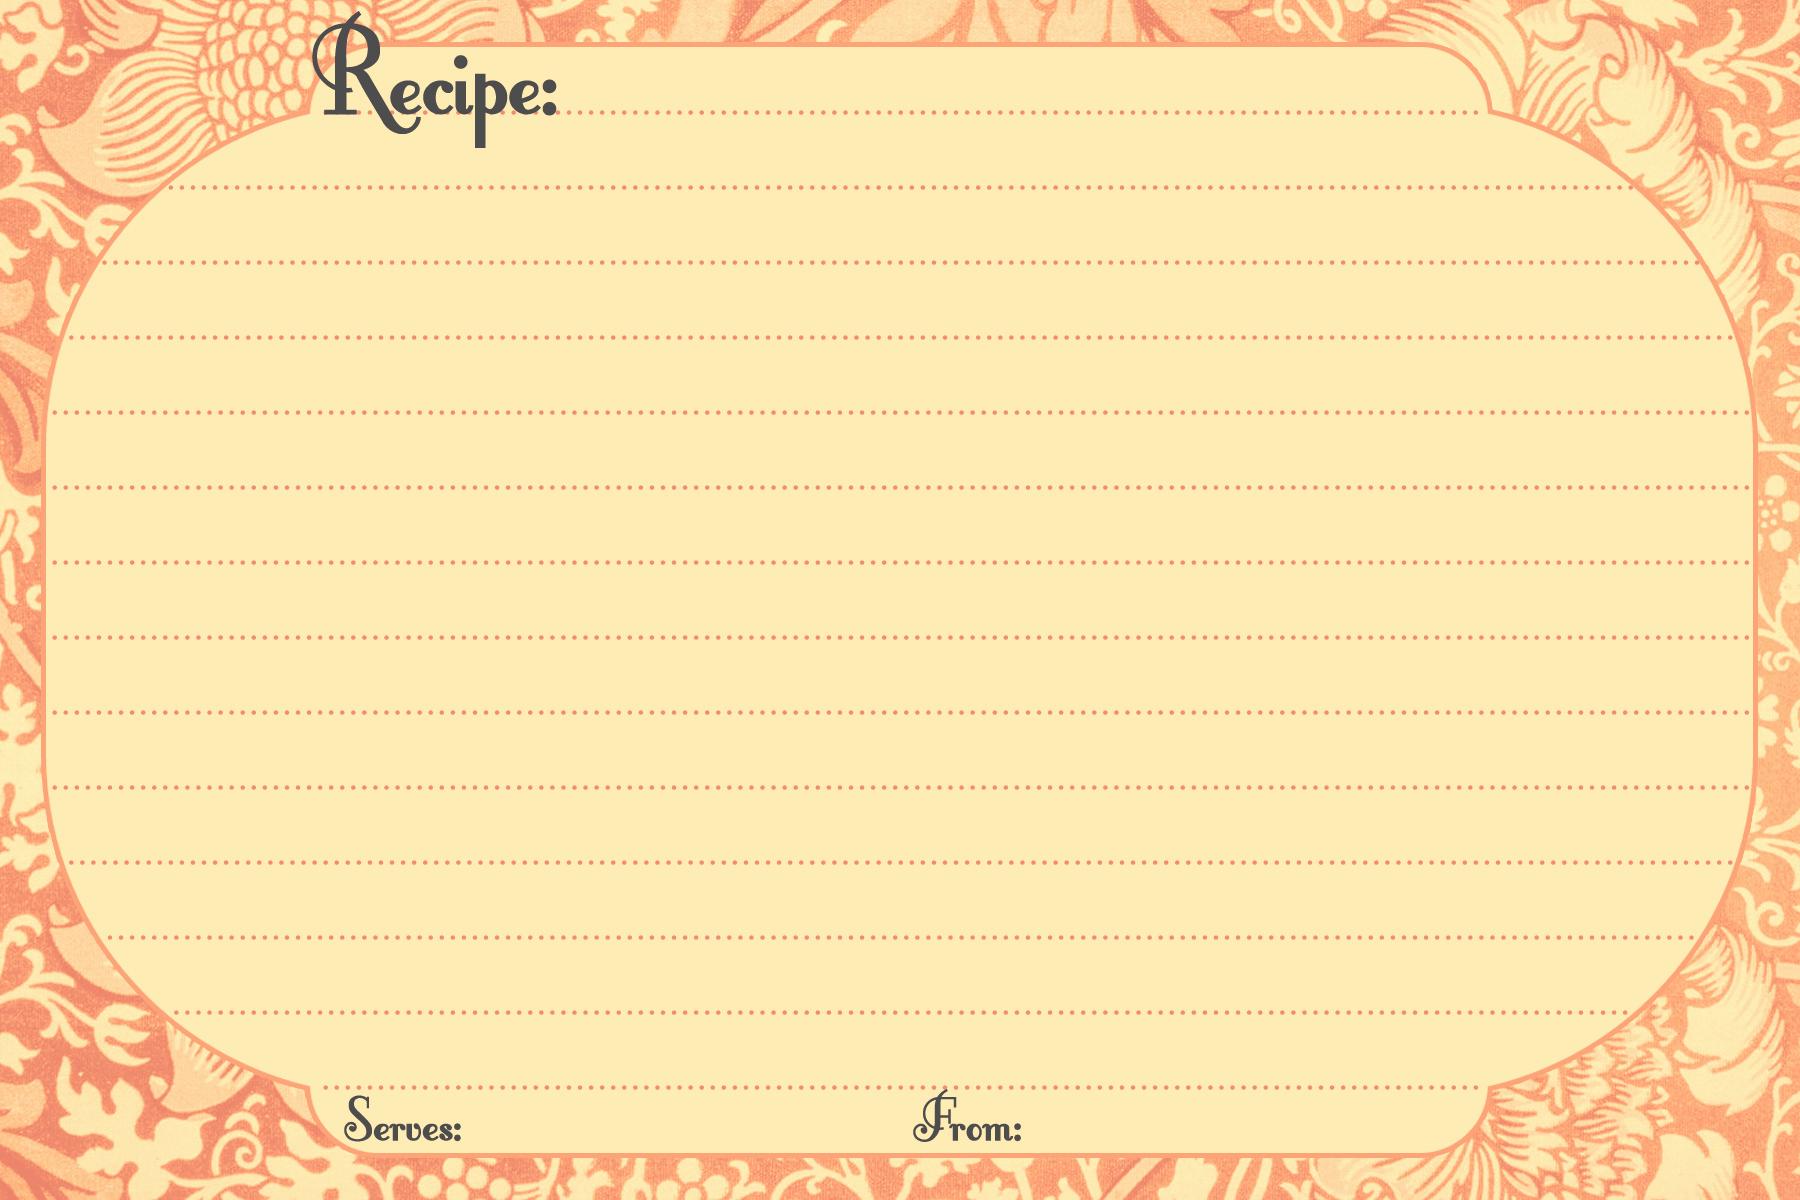 Recipe Card Templates for Word Elegant Free Printable Recipe Cards